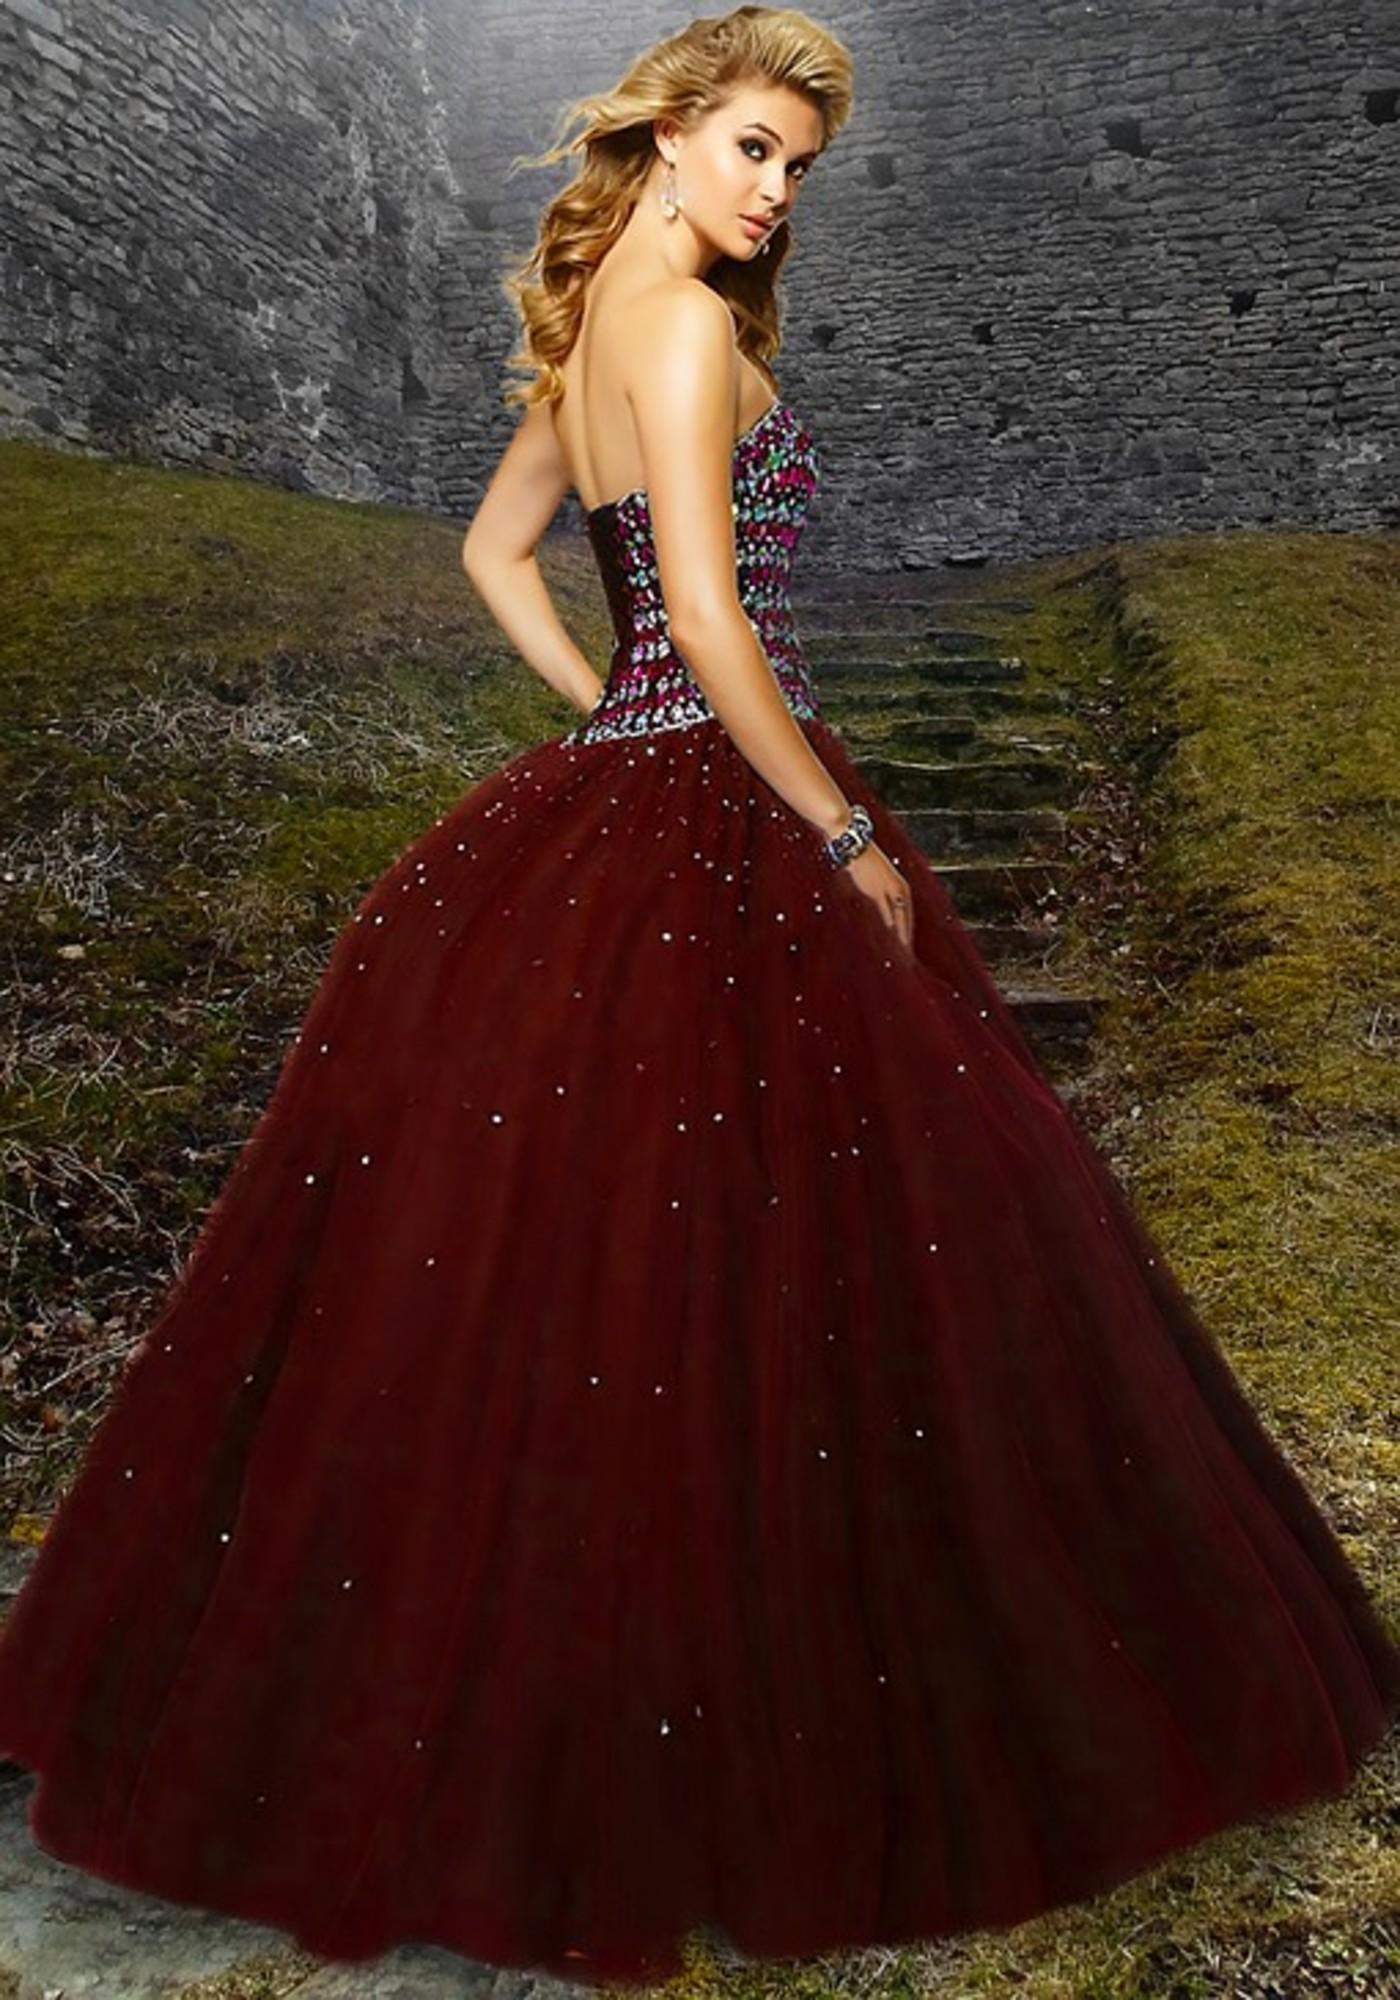 modelballgown